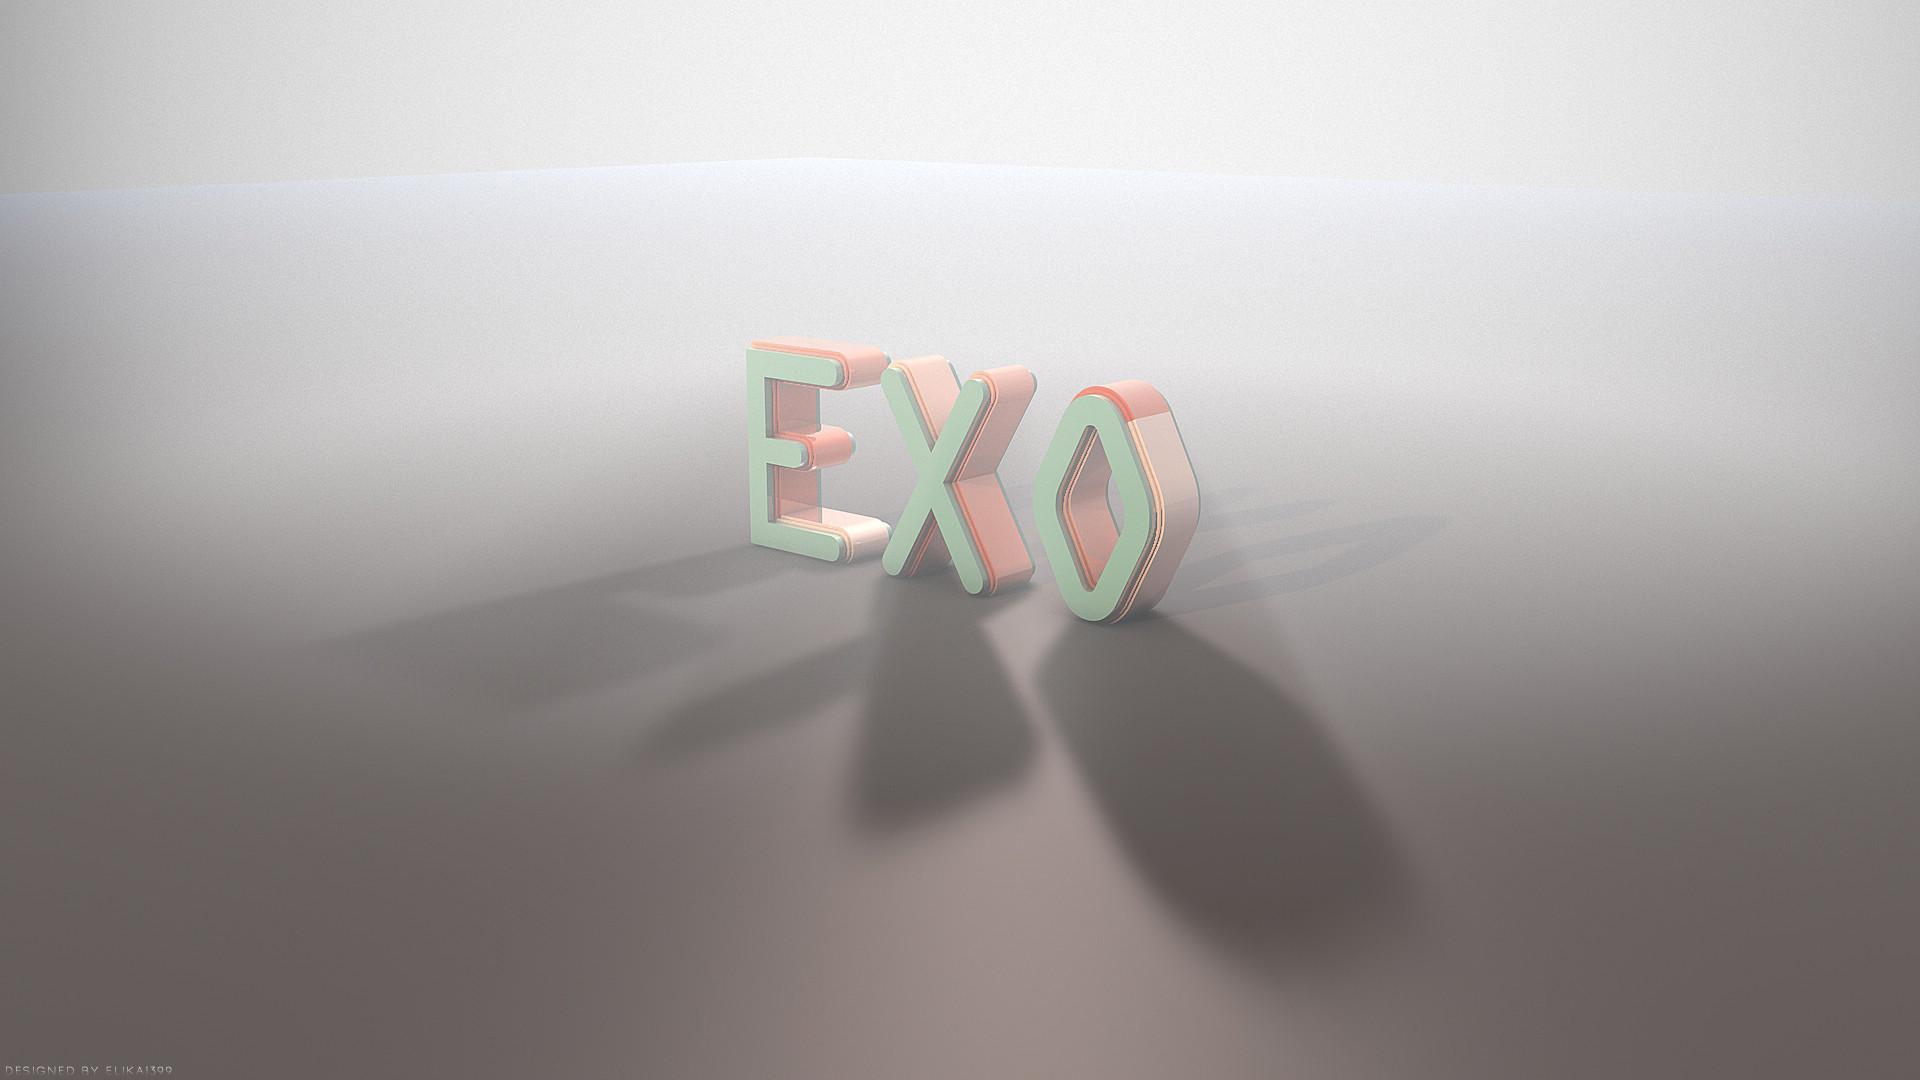 Exo Aesthetic Wallpaper Desktop Exo 2020